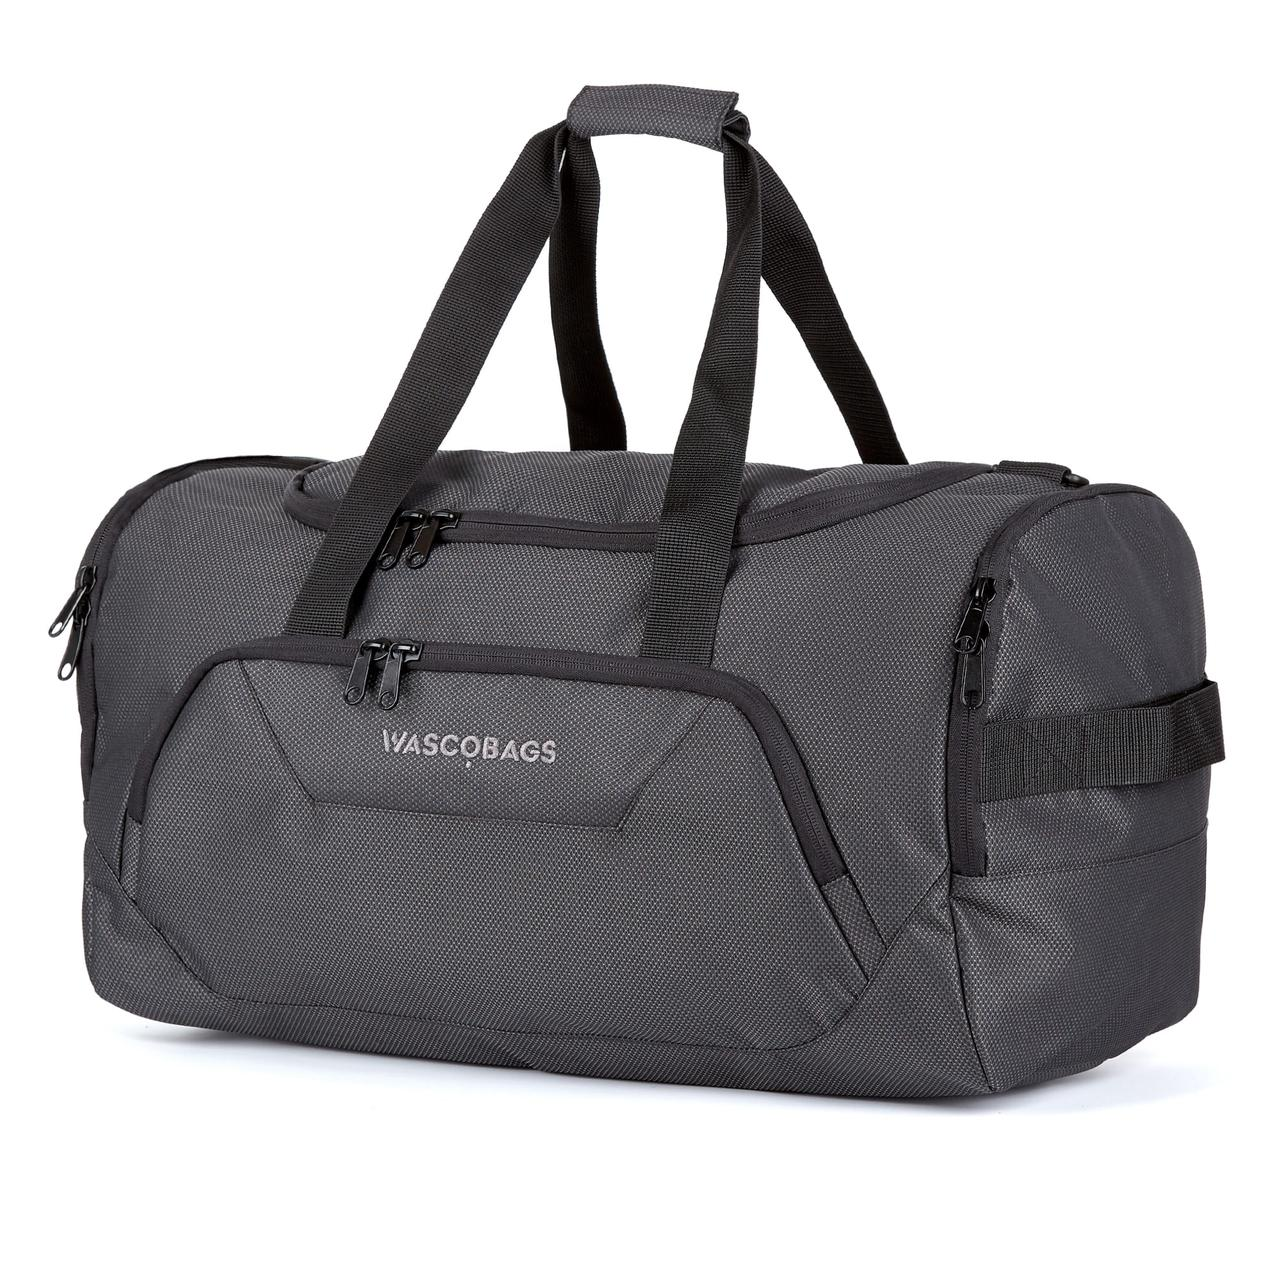 Дорожная сумка Wascobags Boston Графит (45 L)